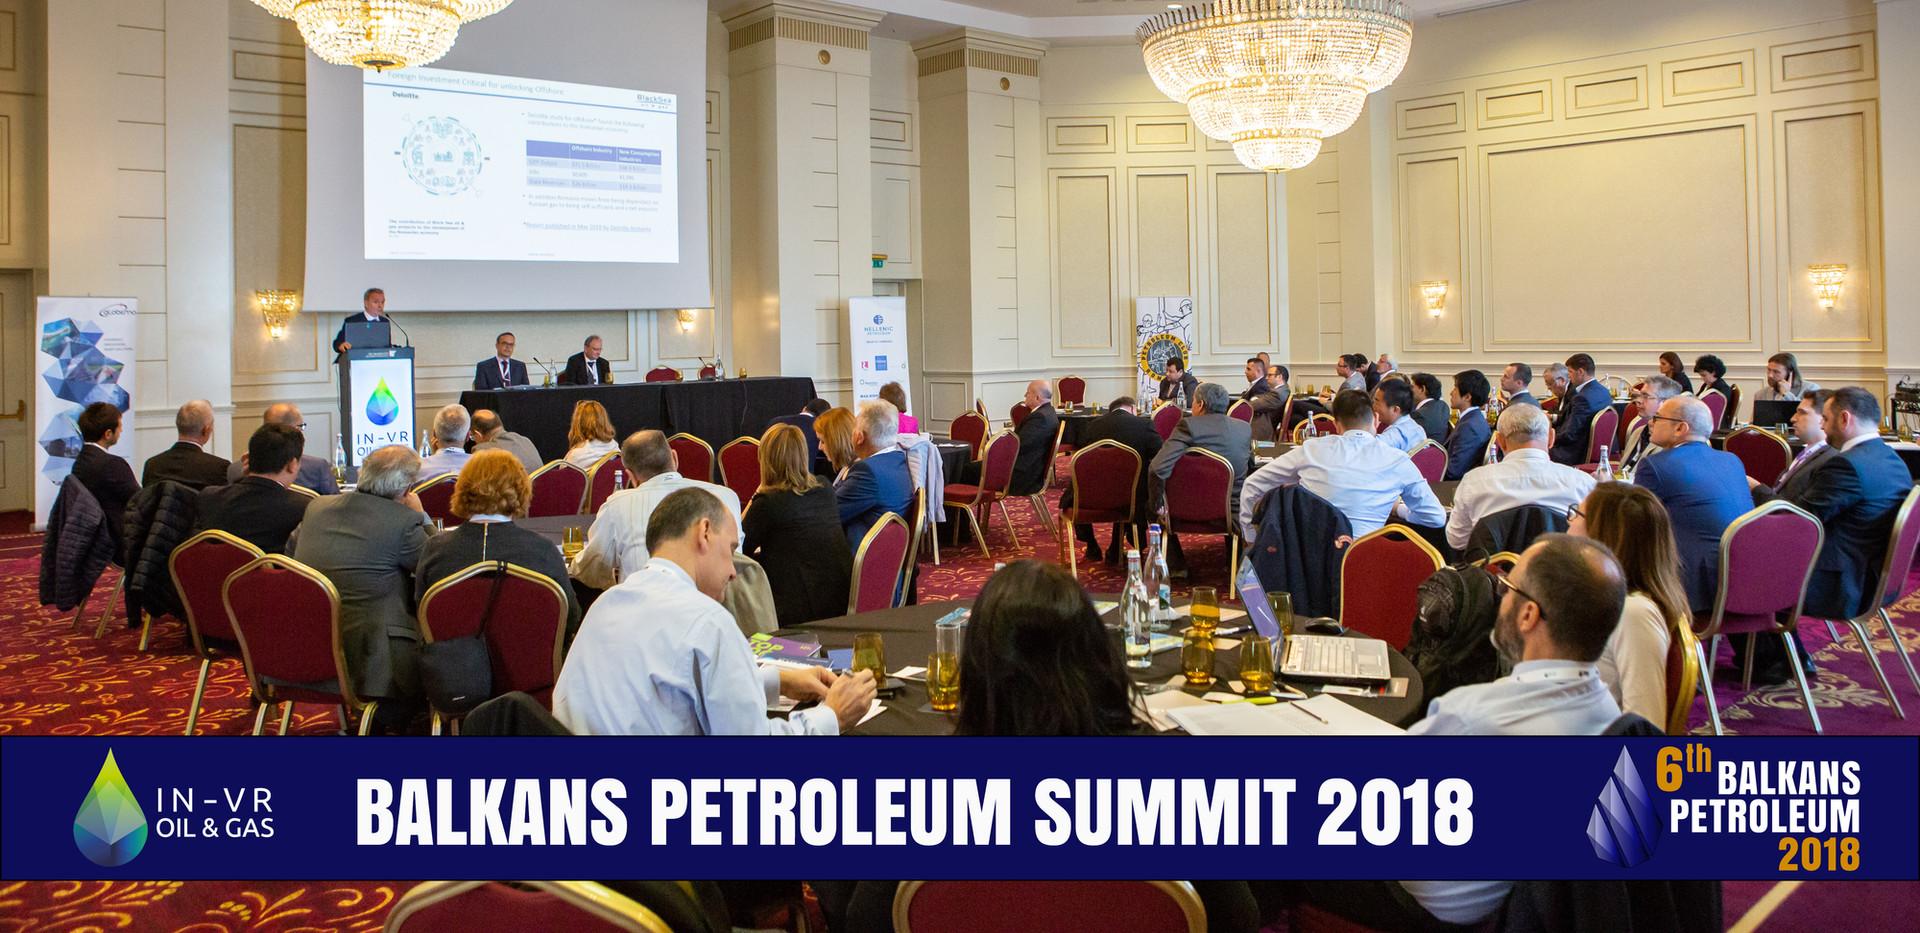 Balkans Petroleum Summit Photo (15).jpg